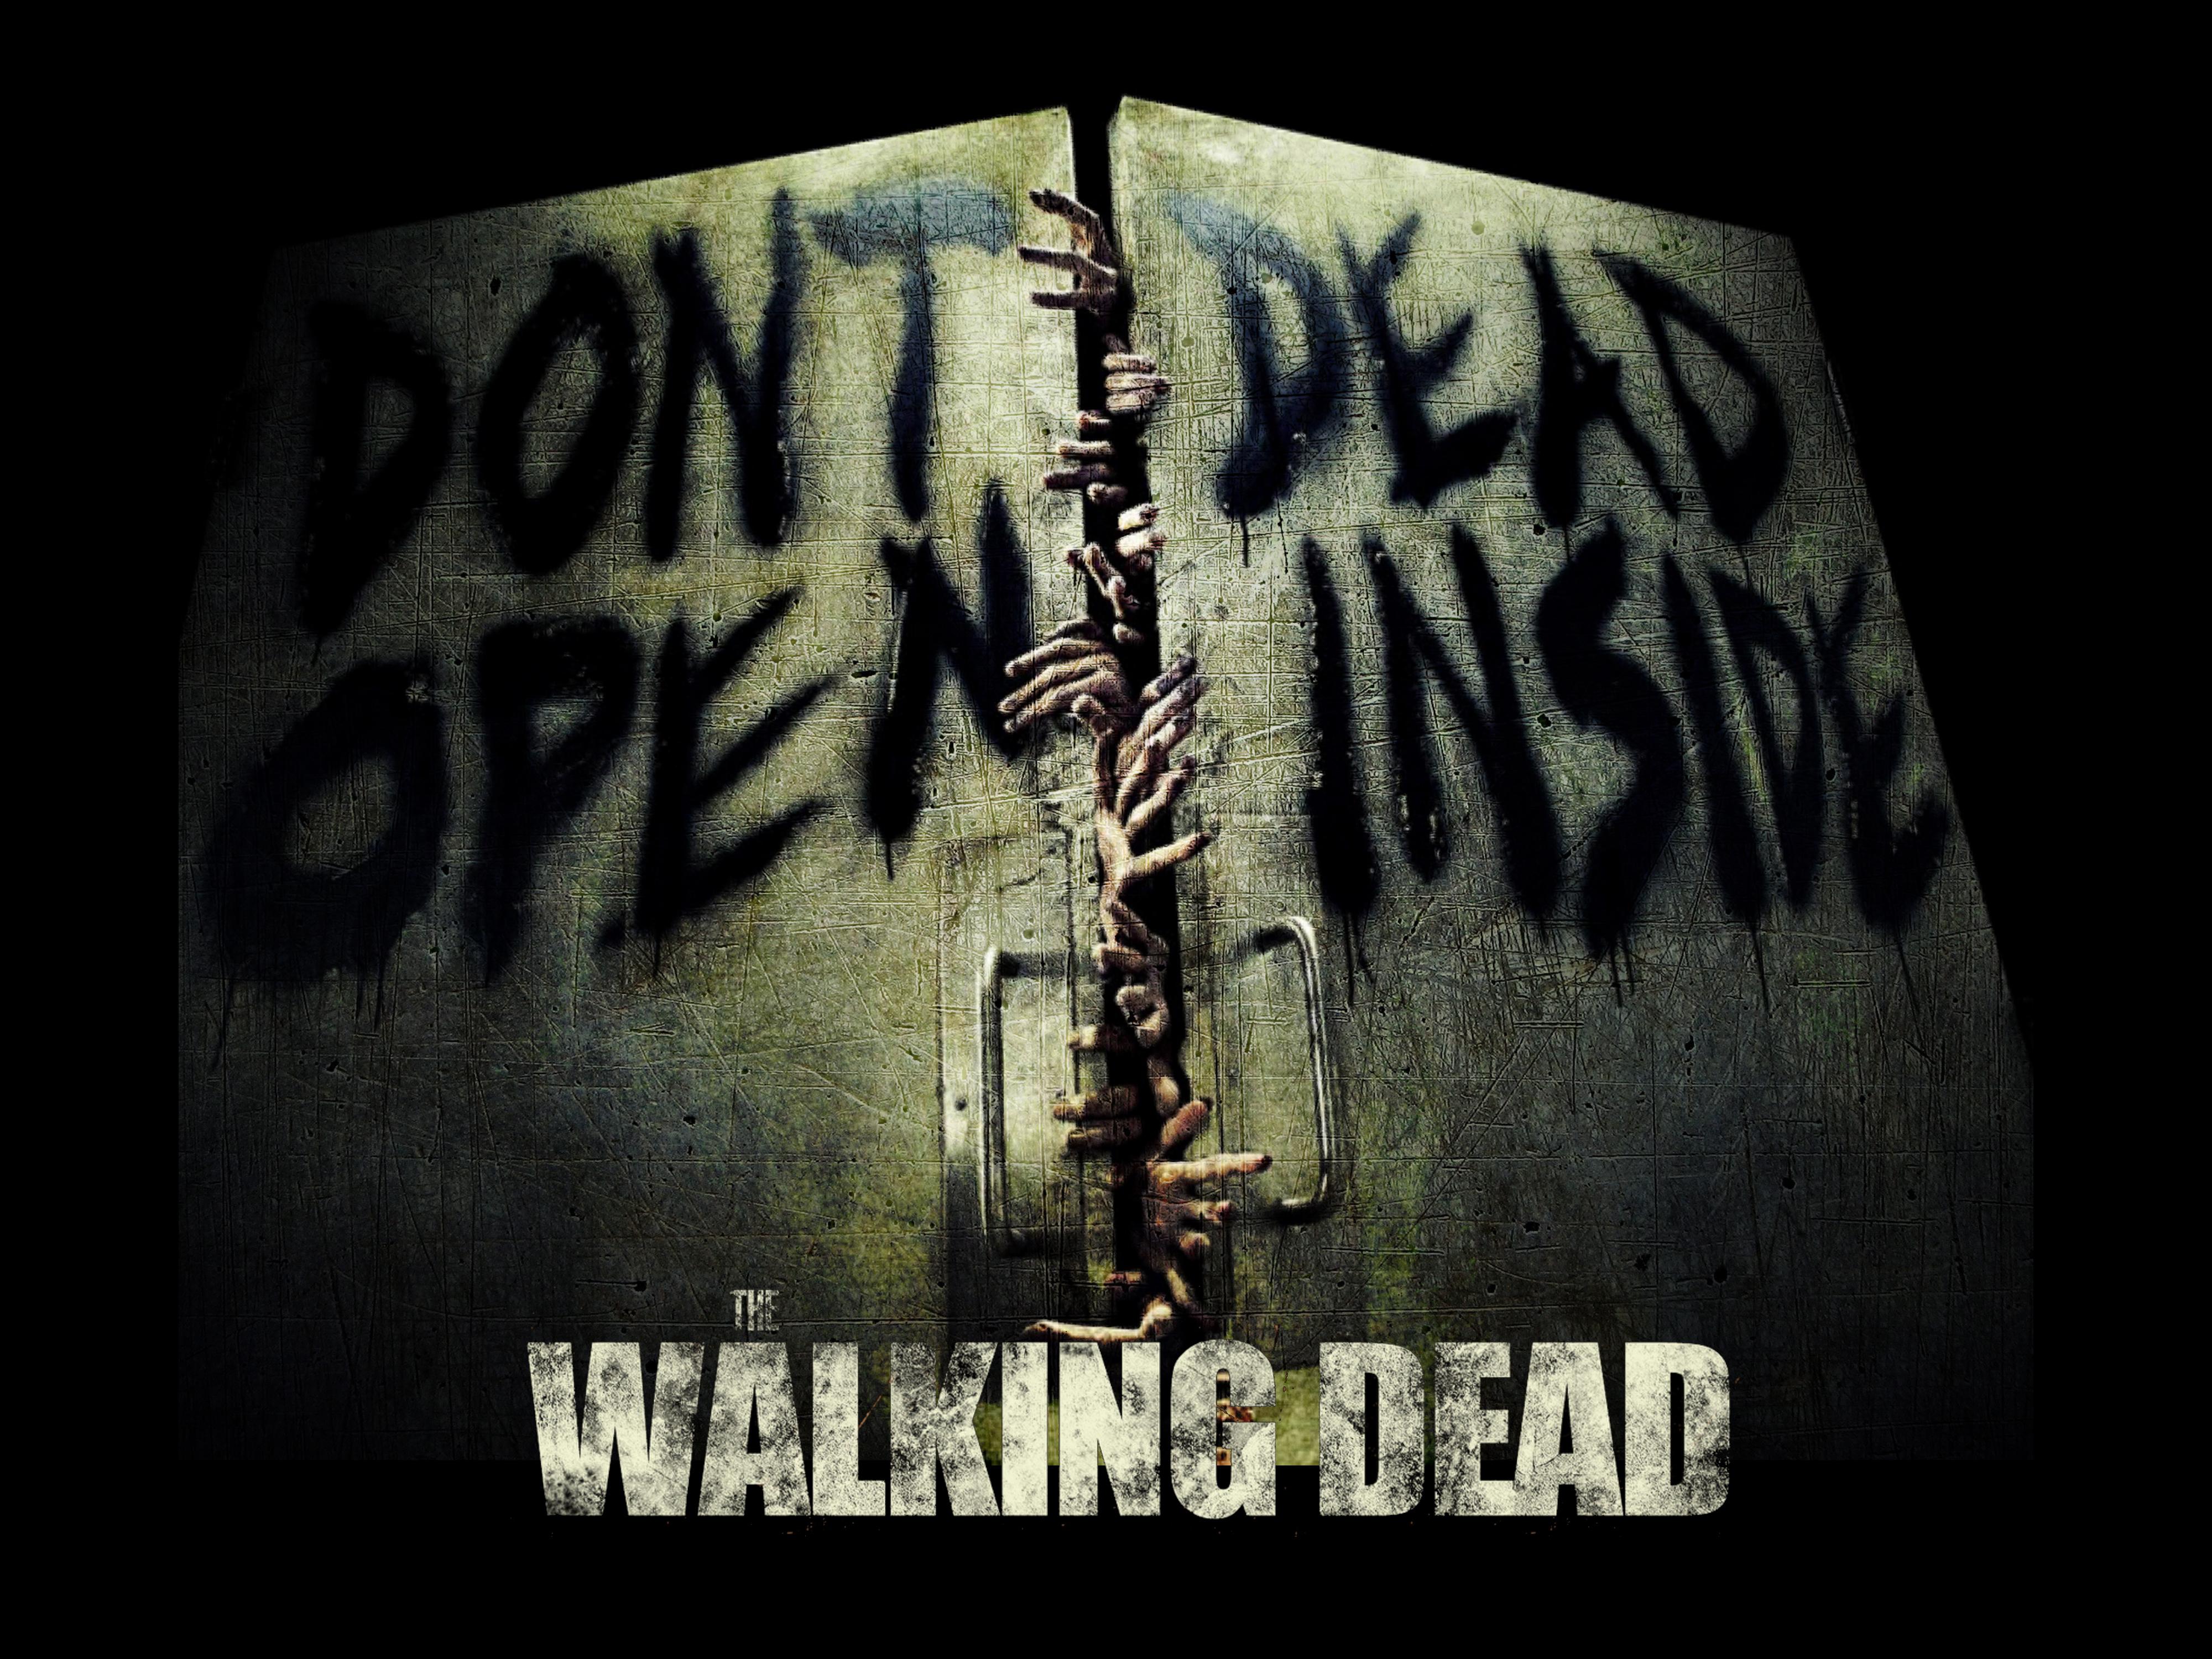 The Walking Dead Wallpaper Hd Wallpapersafari